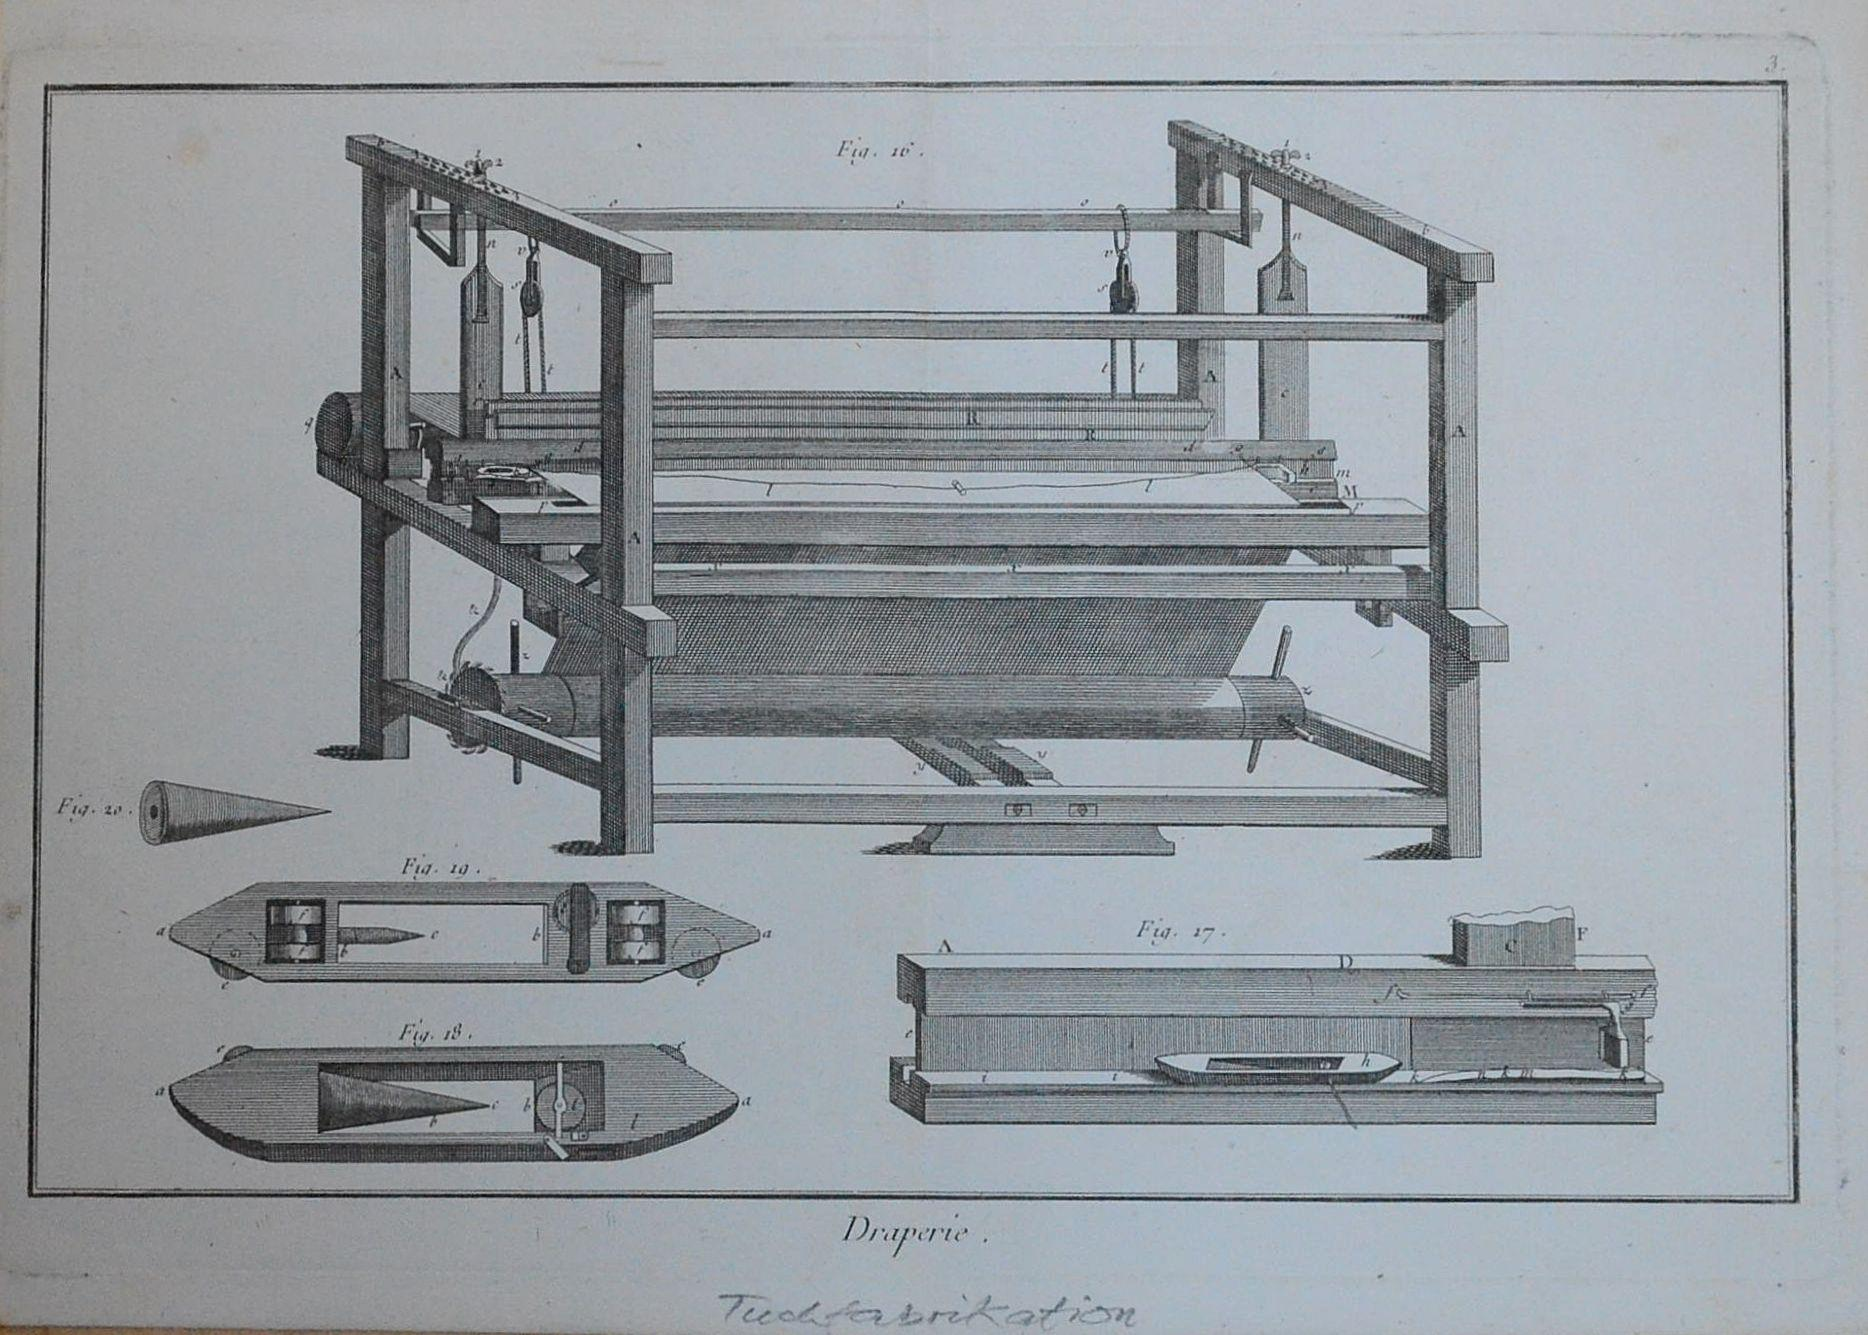 Draperie. Tuchfabrikation. Blatt 3.: Kupferstich.